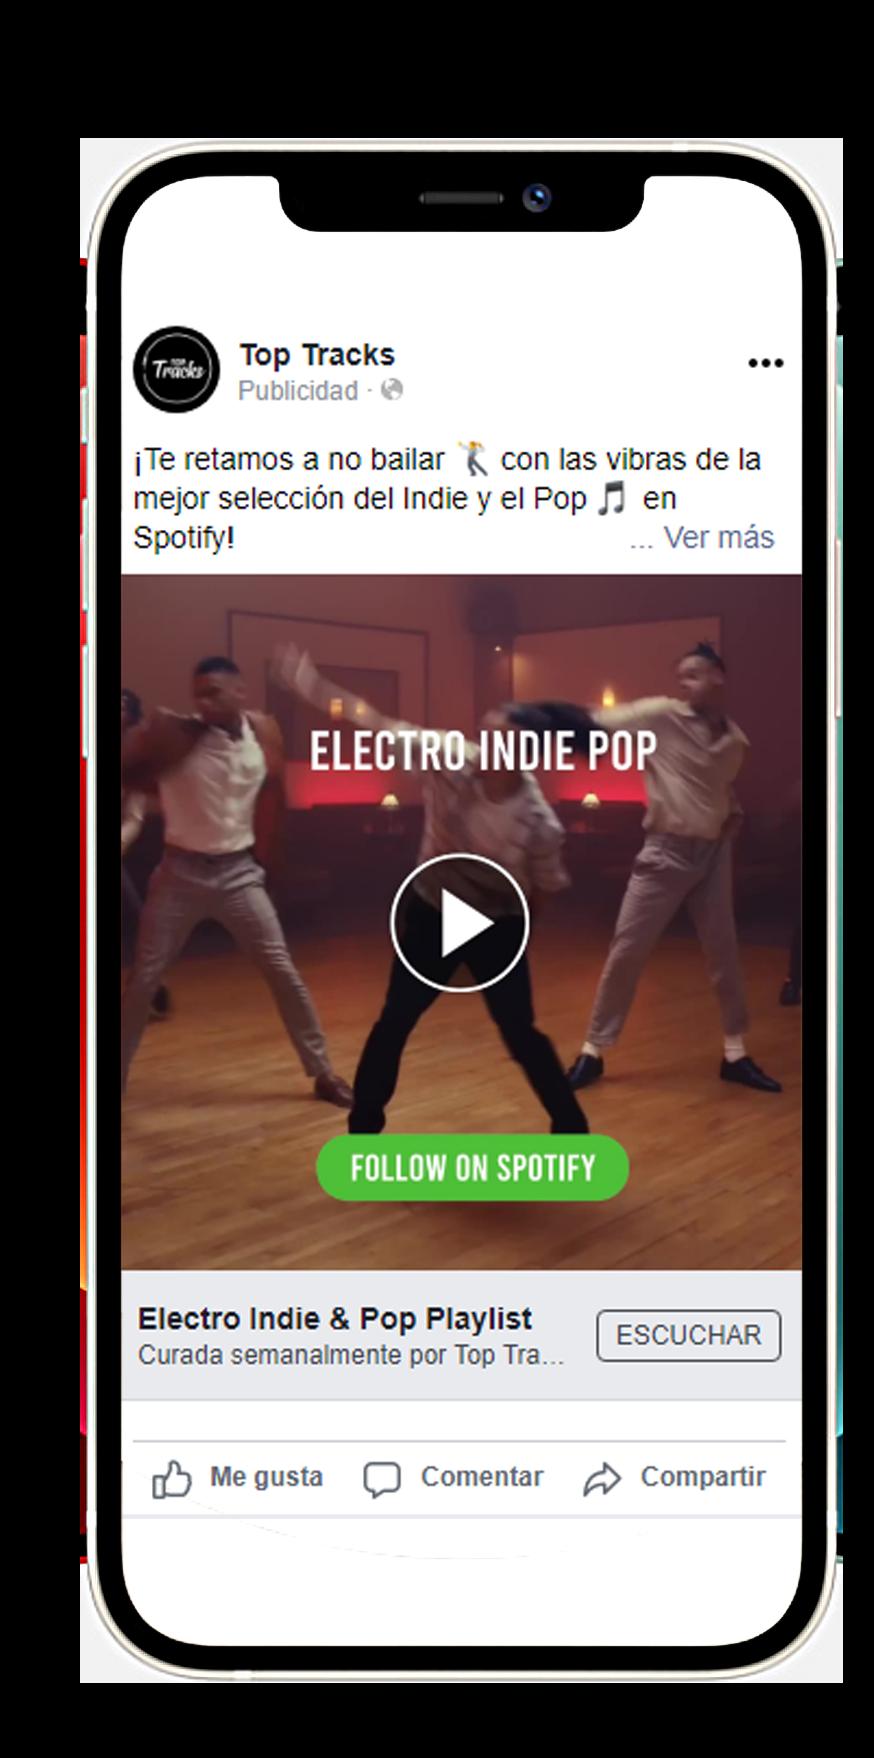 Collab Playlisting Ads